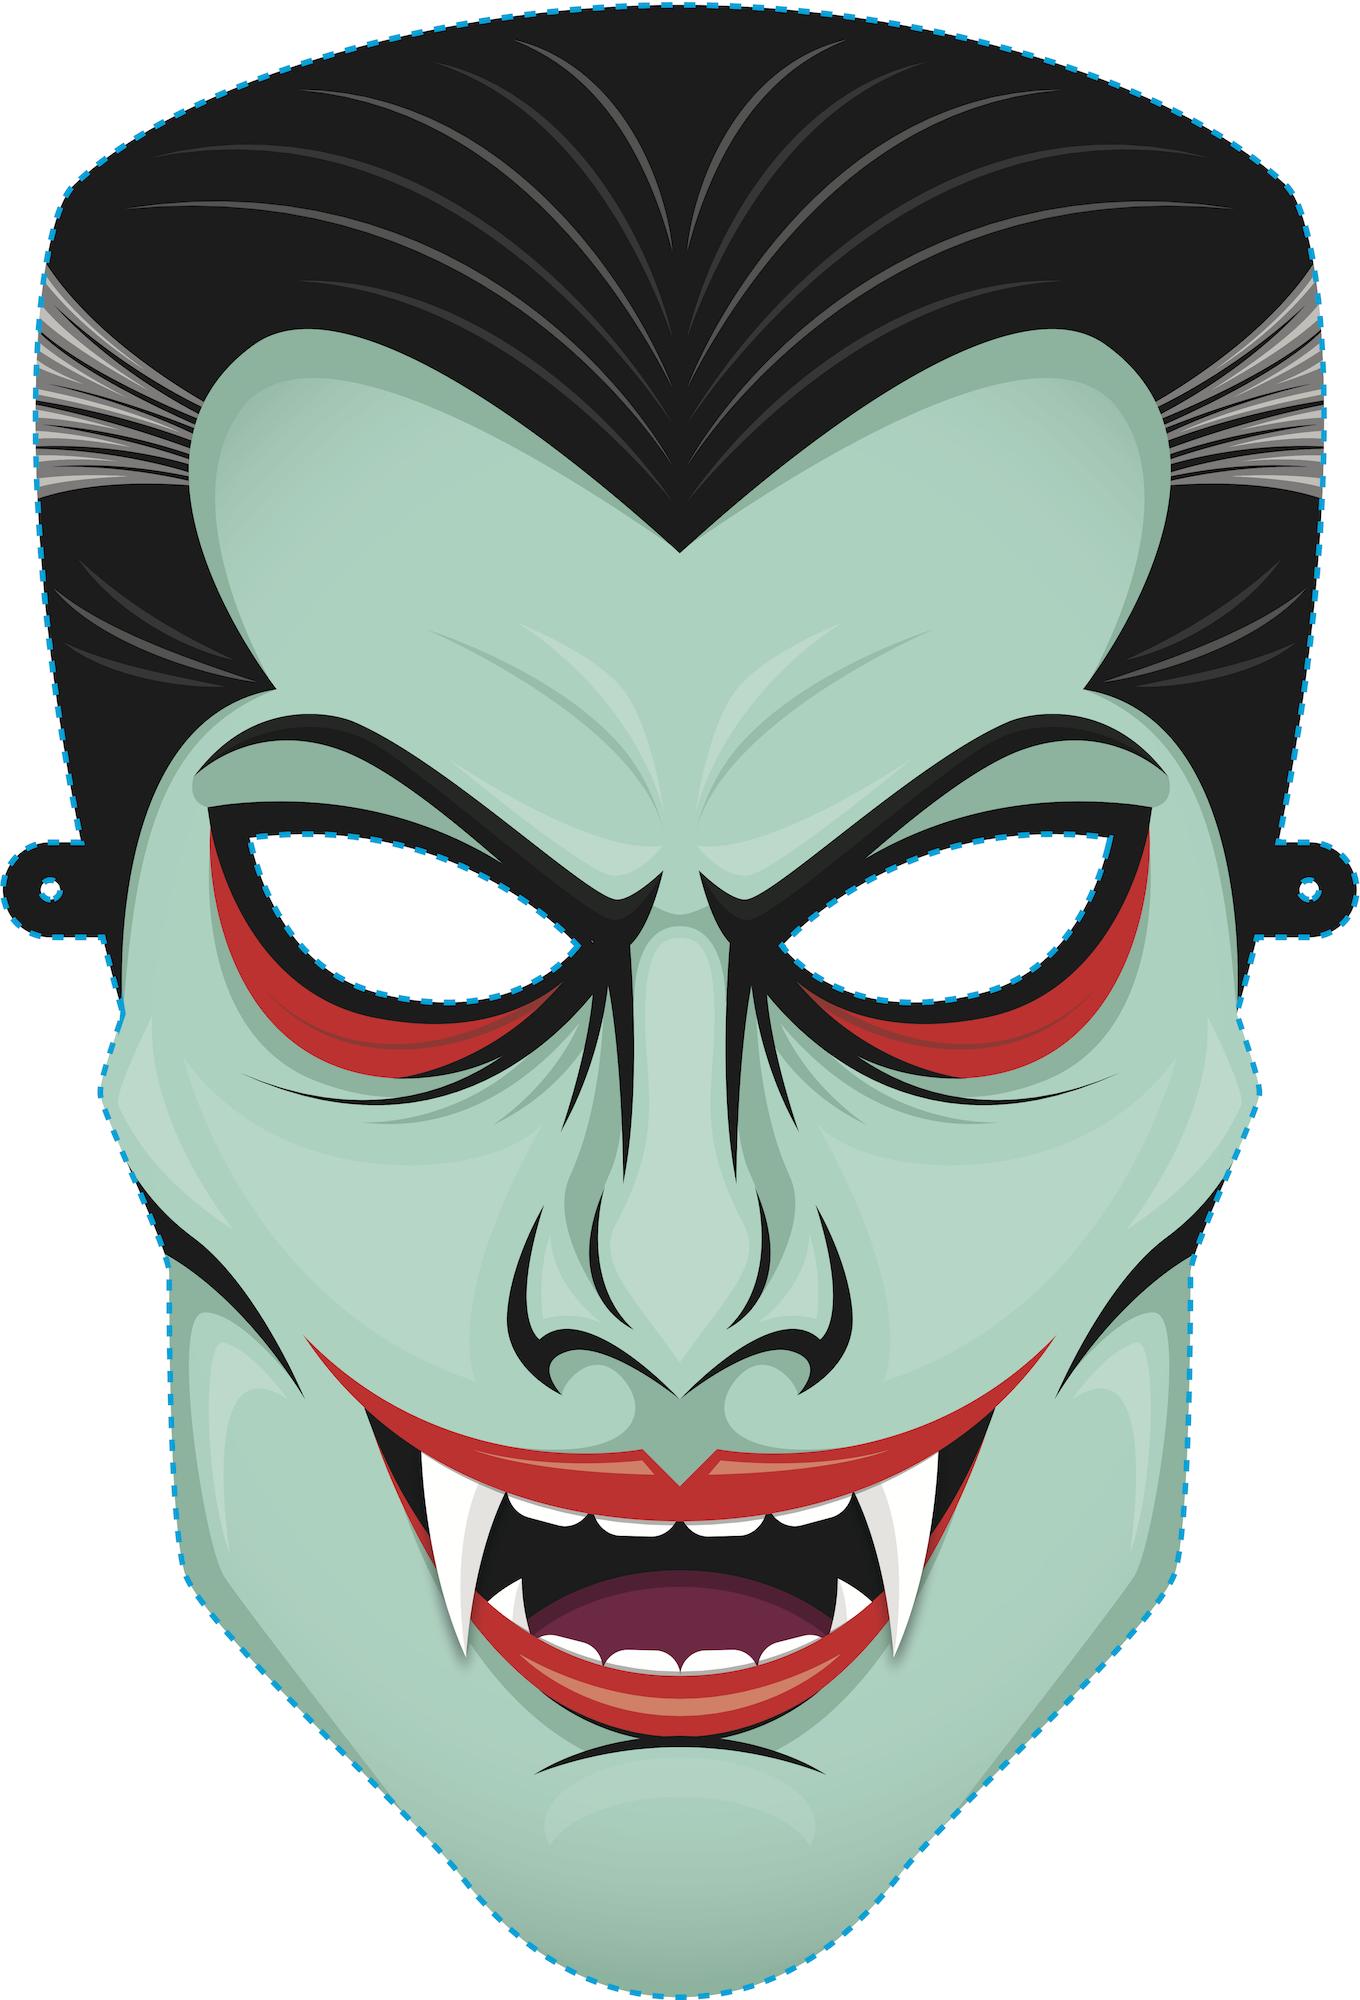 Download Vampire Mask For Free Printable Halloween Masks